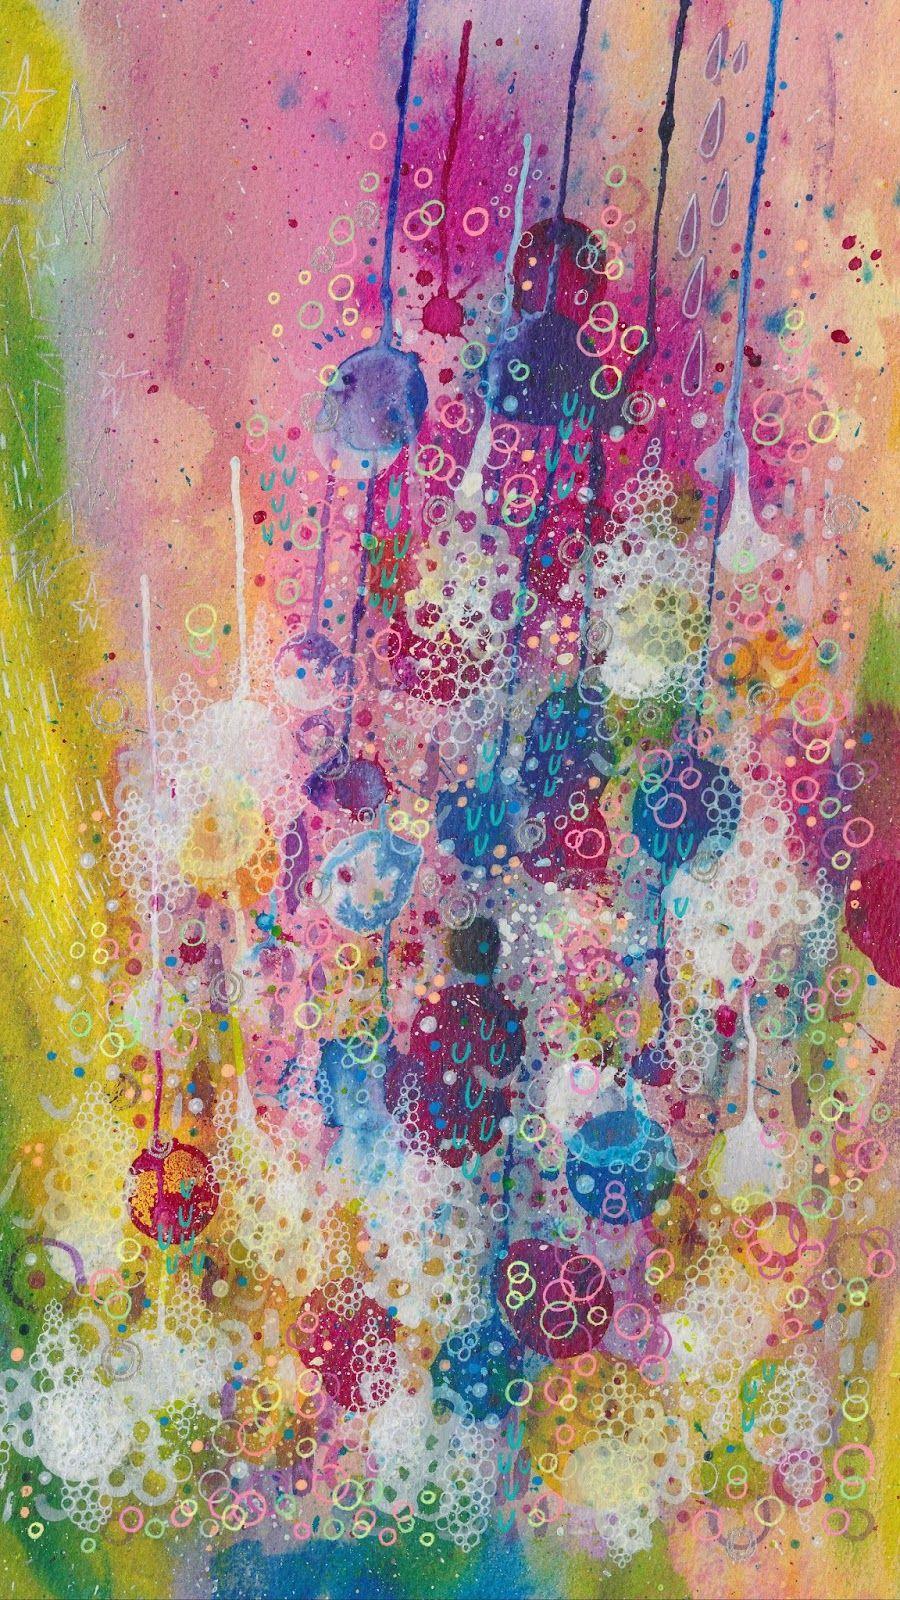 City Street Rainy Day Oil Painting Hd Wallpaper Rain Painting